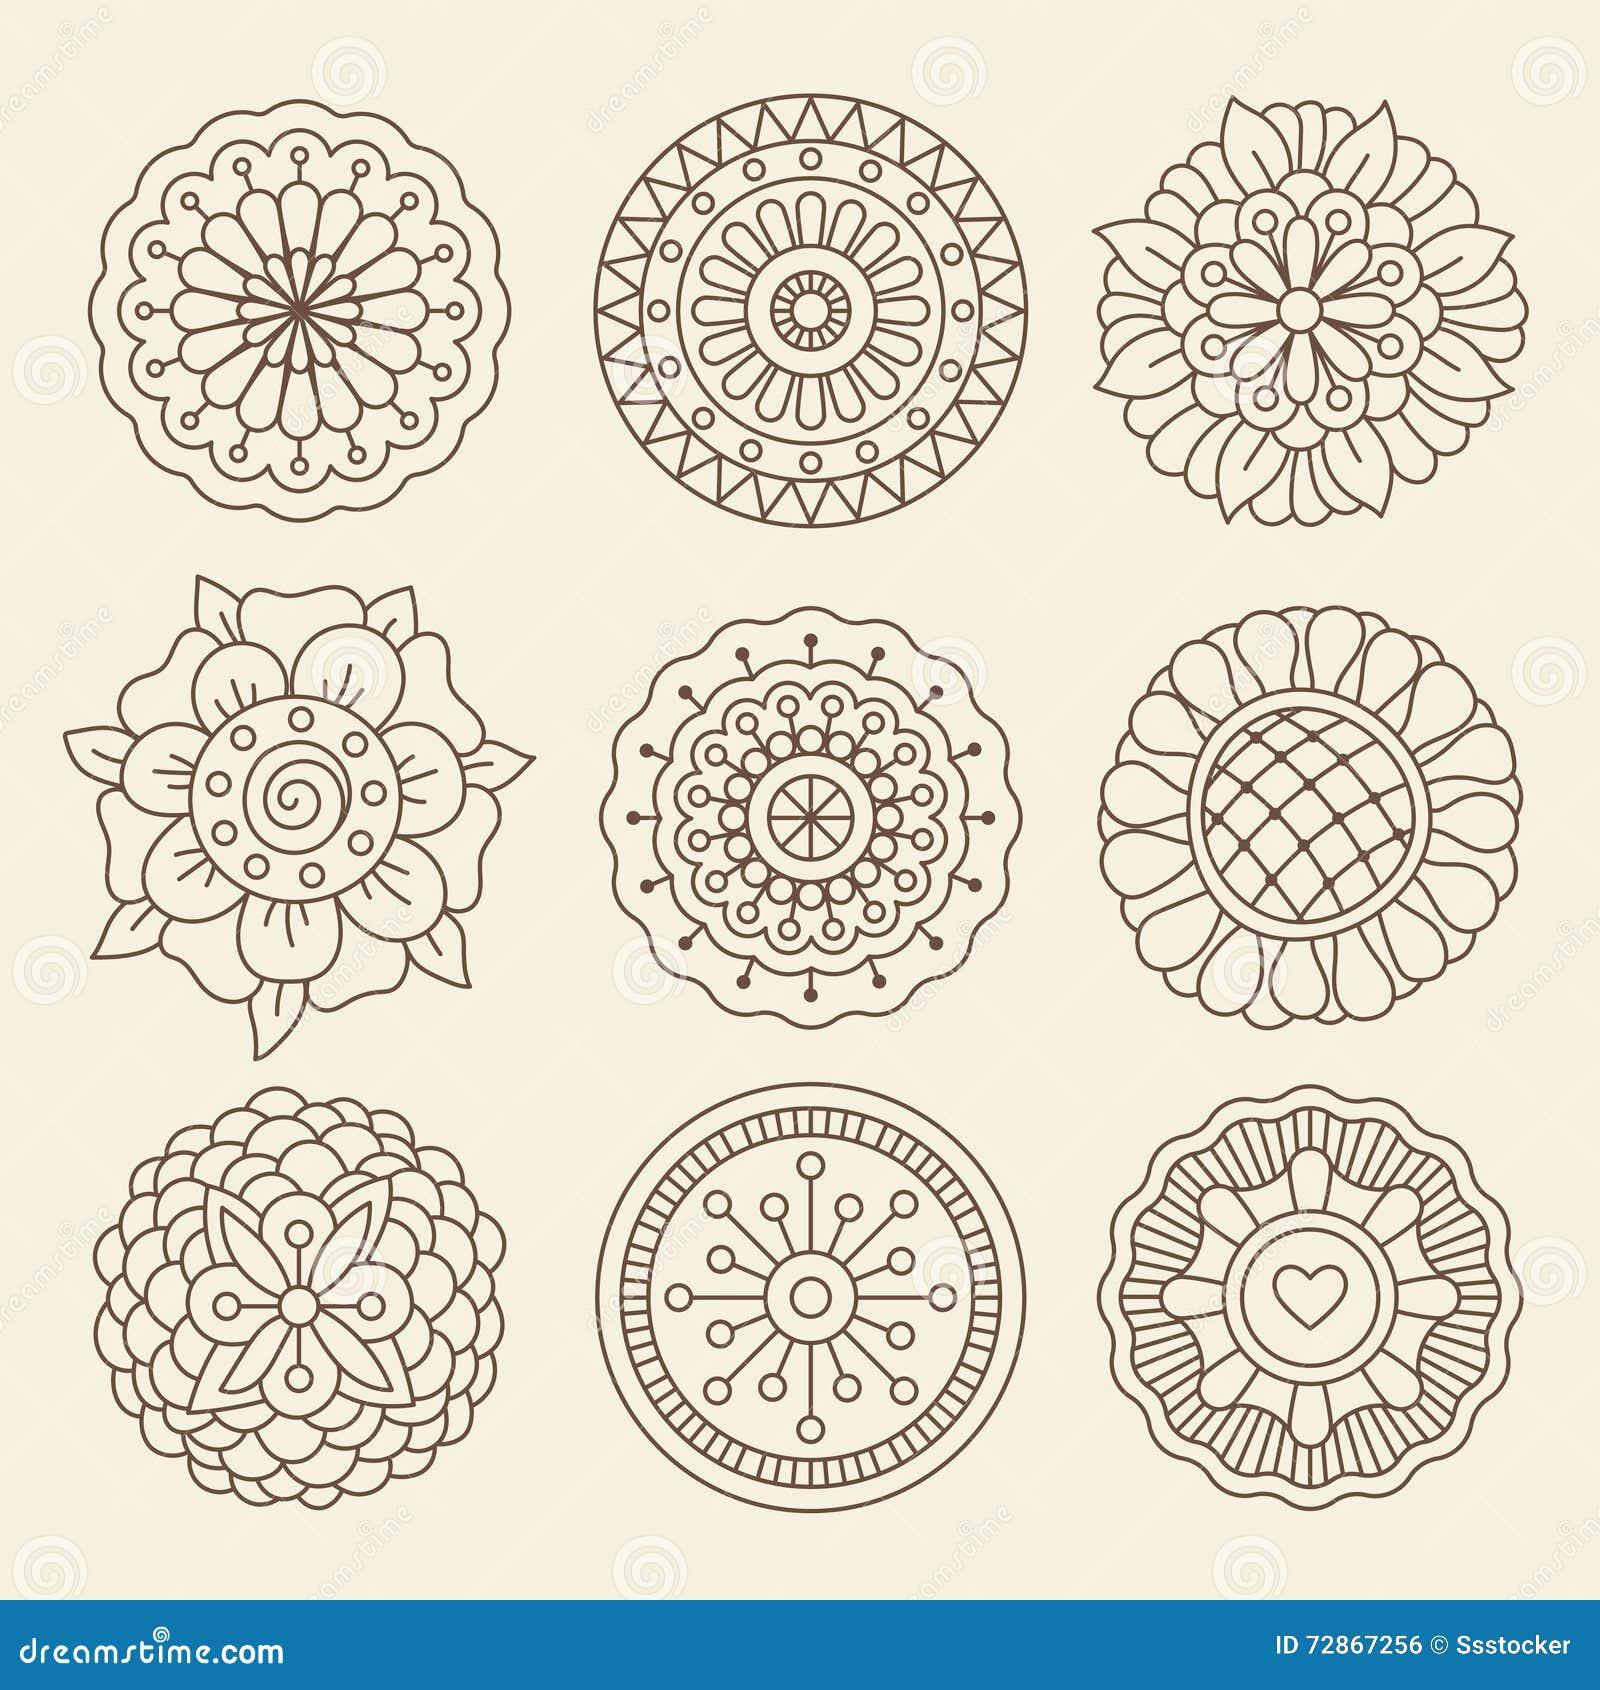 Mehndi Indian Henna Tattoo Flowers Stock Vector - Image